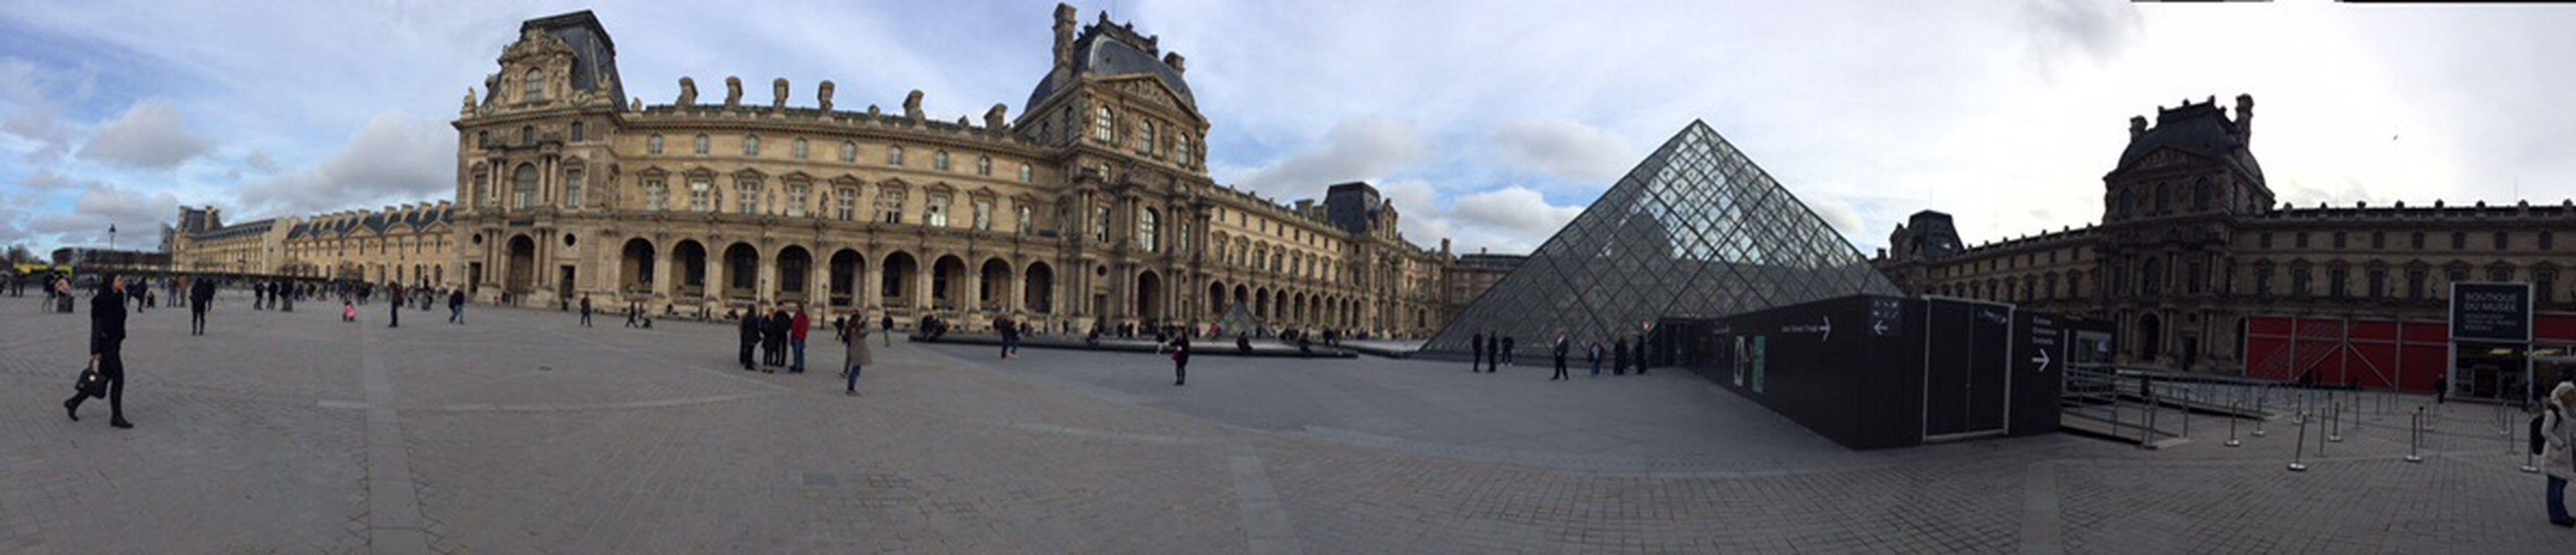 France Paris ❤ Musée De Luvre Paris Beautiful Paris Love Panaromic View Panaromic Photos